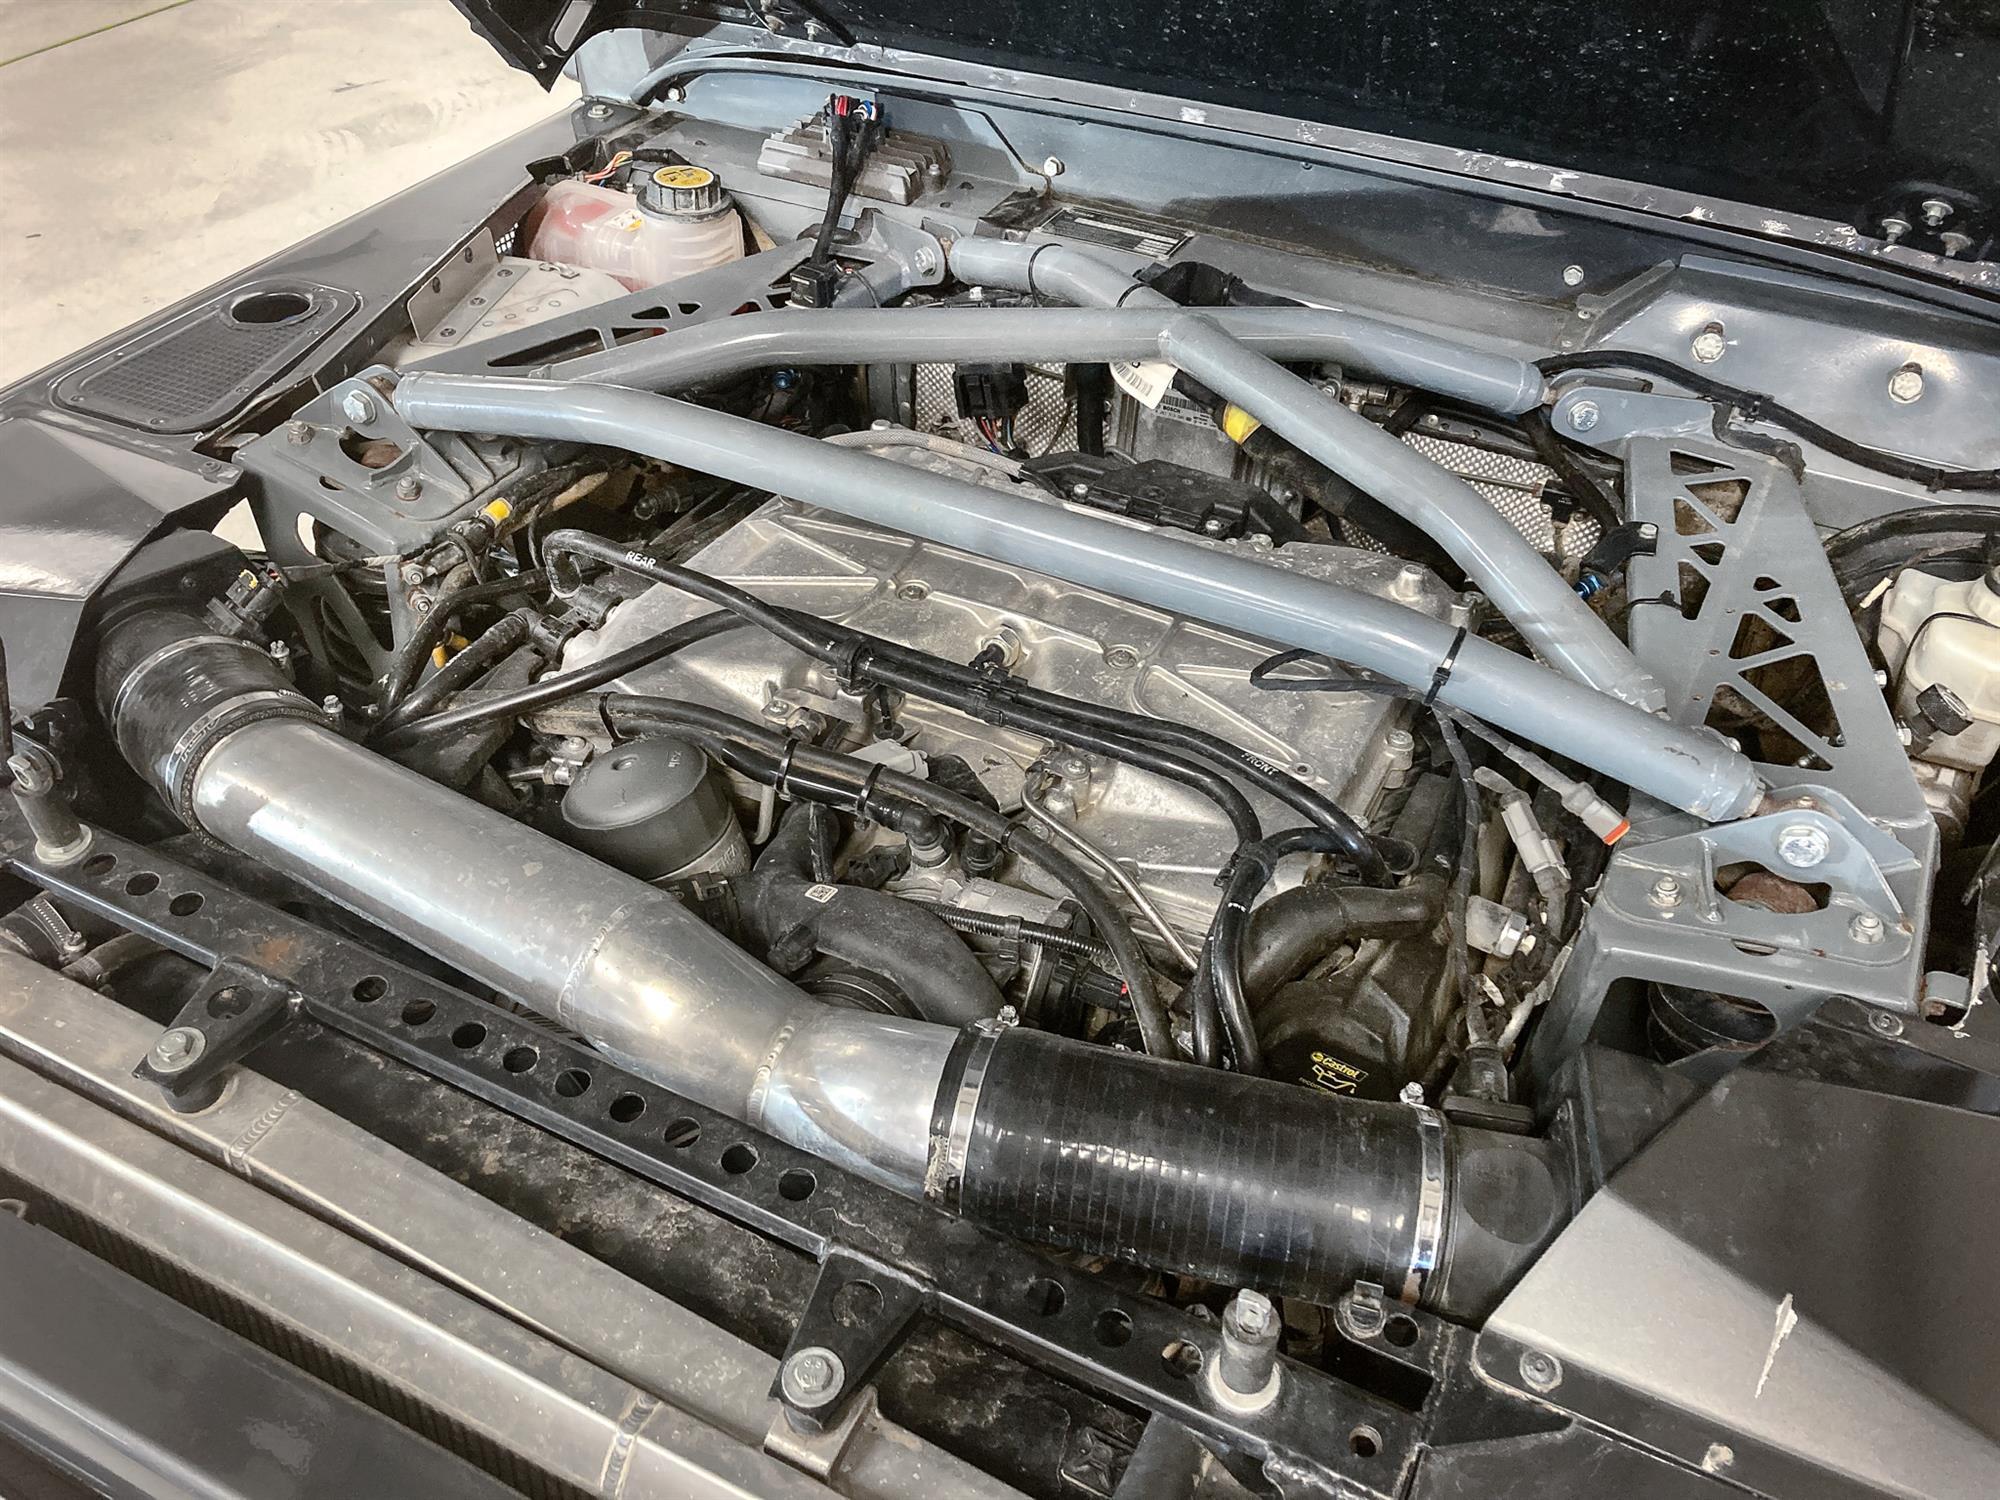 2016 Bowler CSP V8 Prototype 'P1' - Image 7 of 14